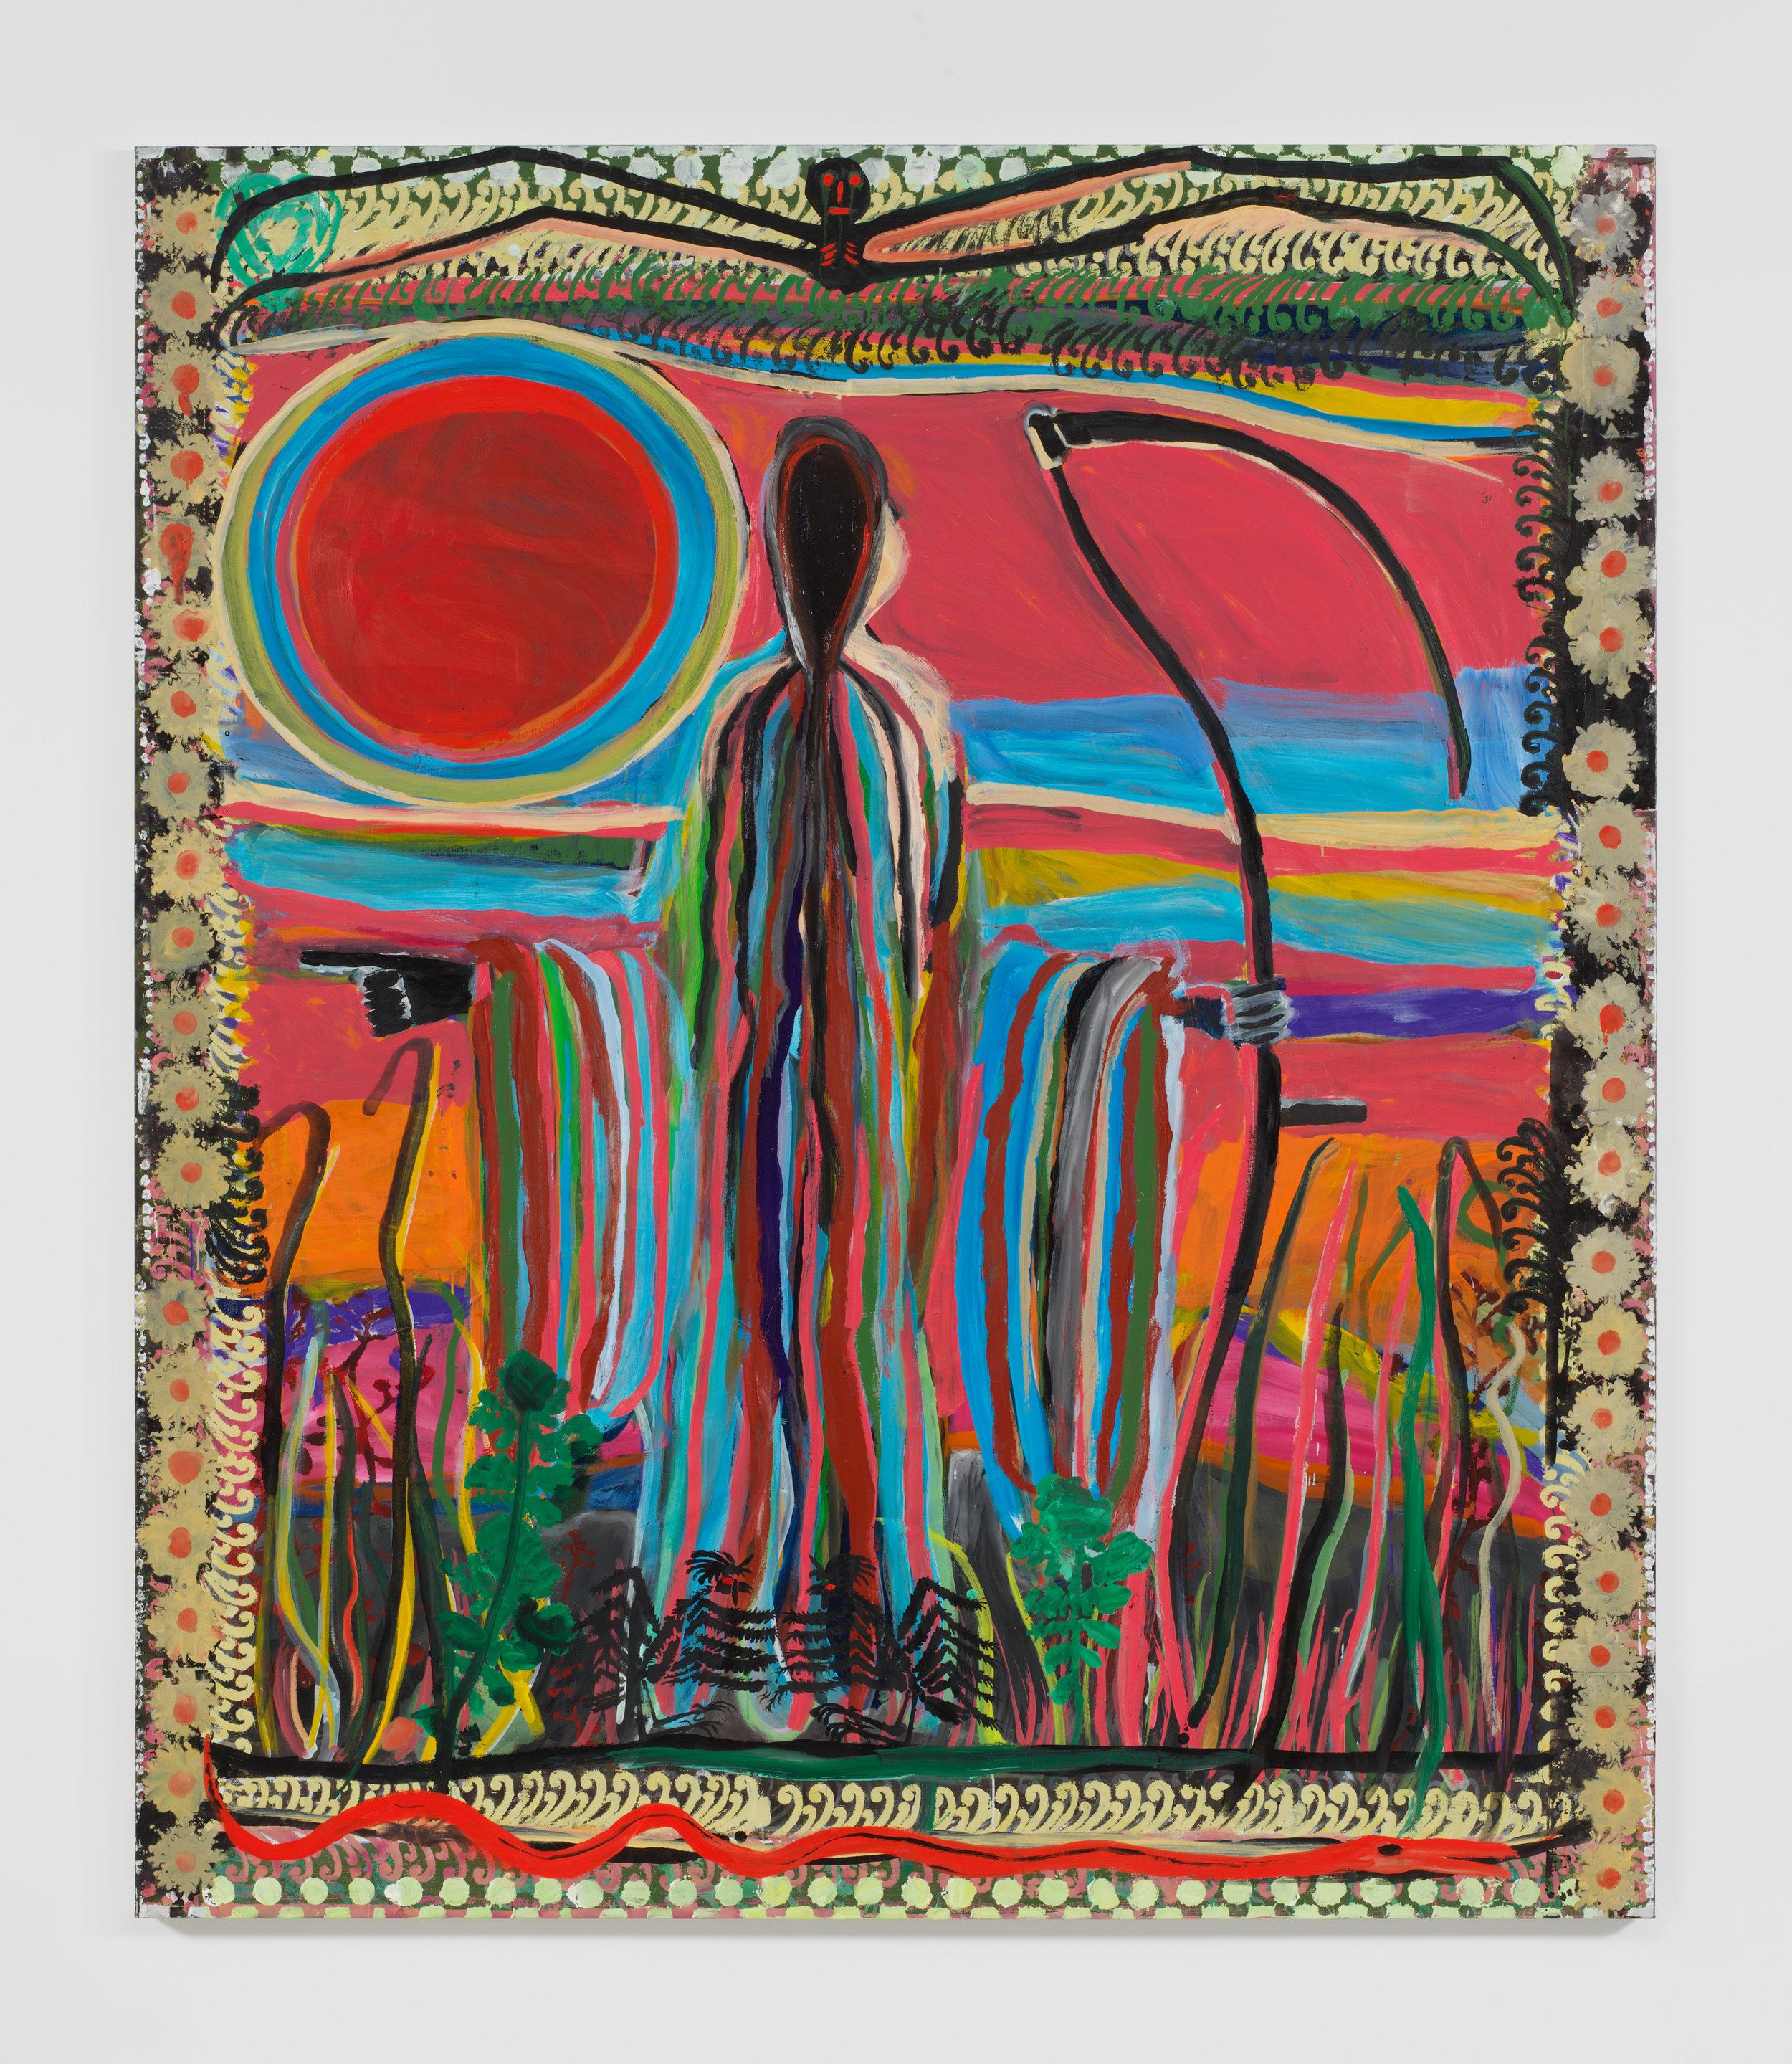 Josh Smith,   Scholes Street , 2019, Oil on linen, 84 x 72 1/8 inches, 213.4 x 183.2 cm